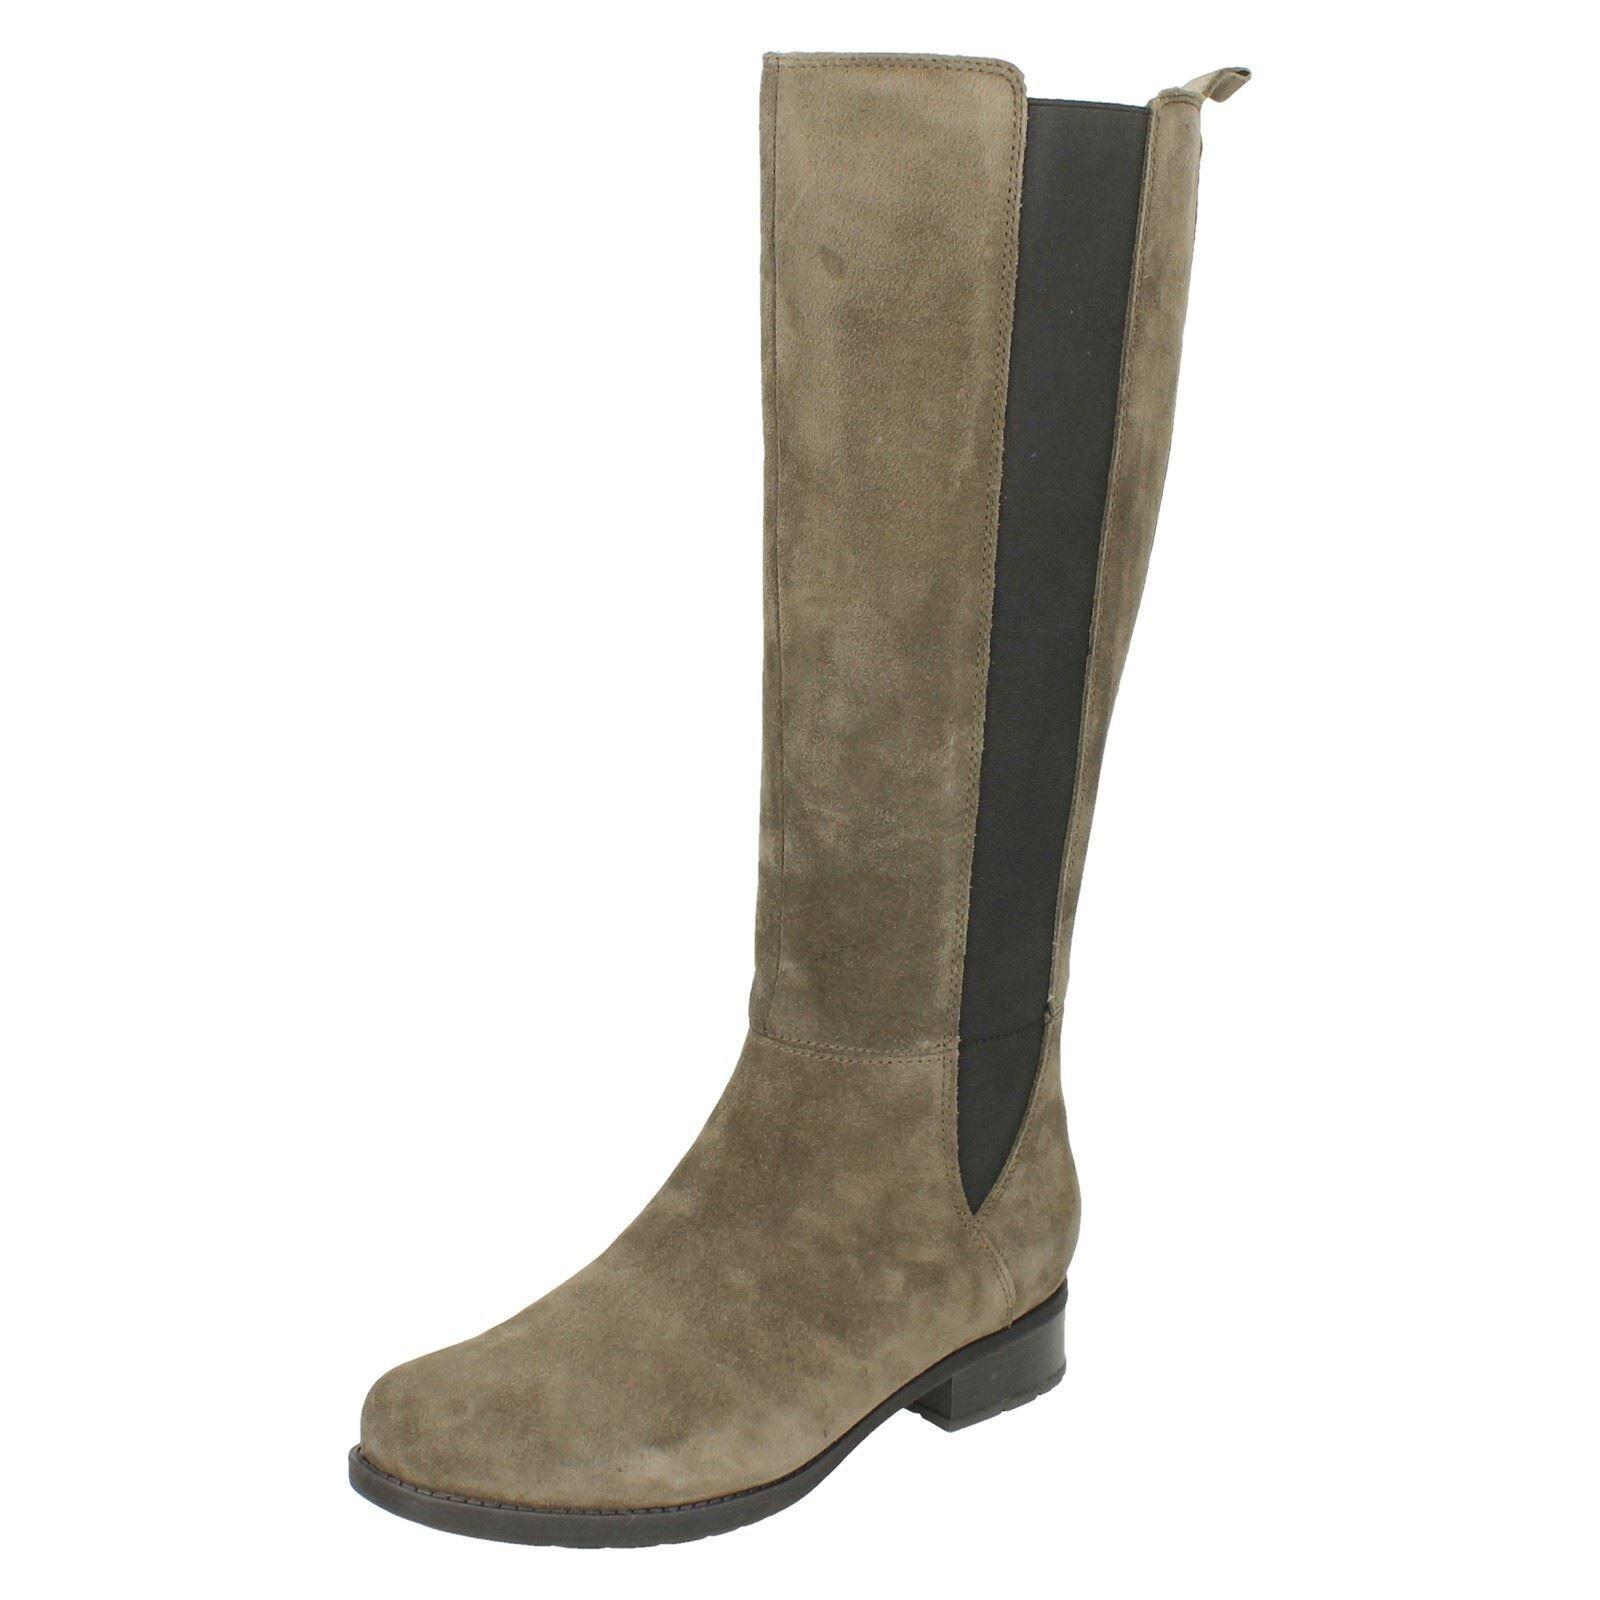 Clarks Ladies Verlie Gail Grey Suede Long Boots Size 5.5 39